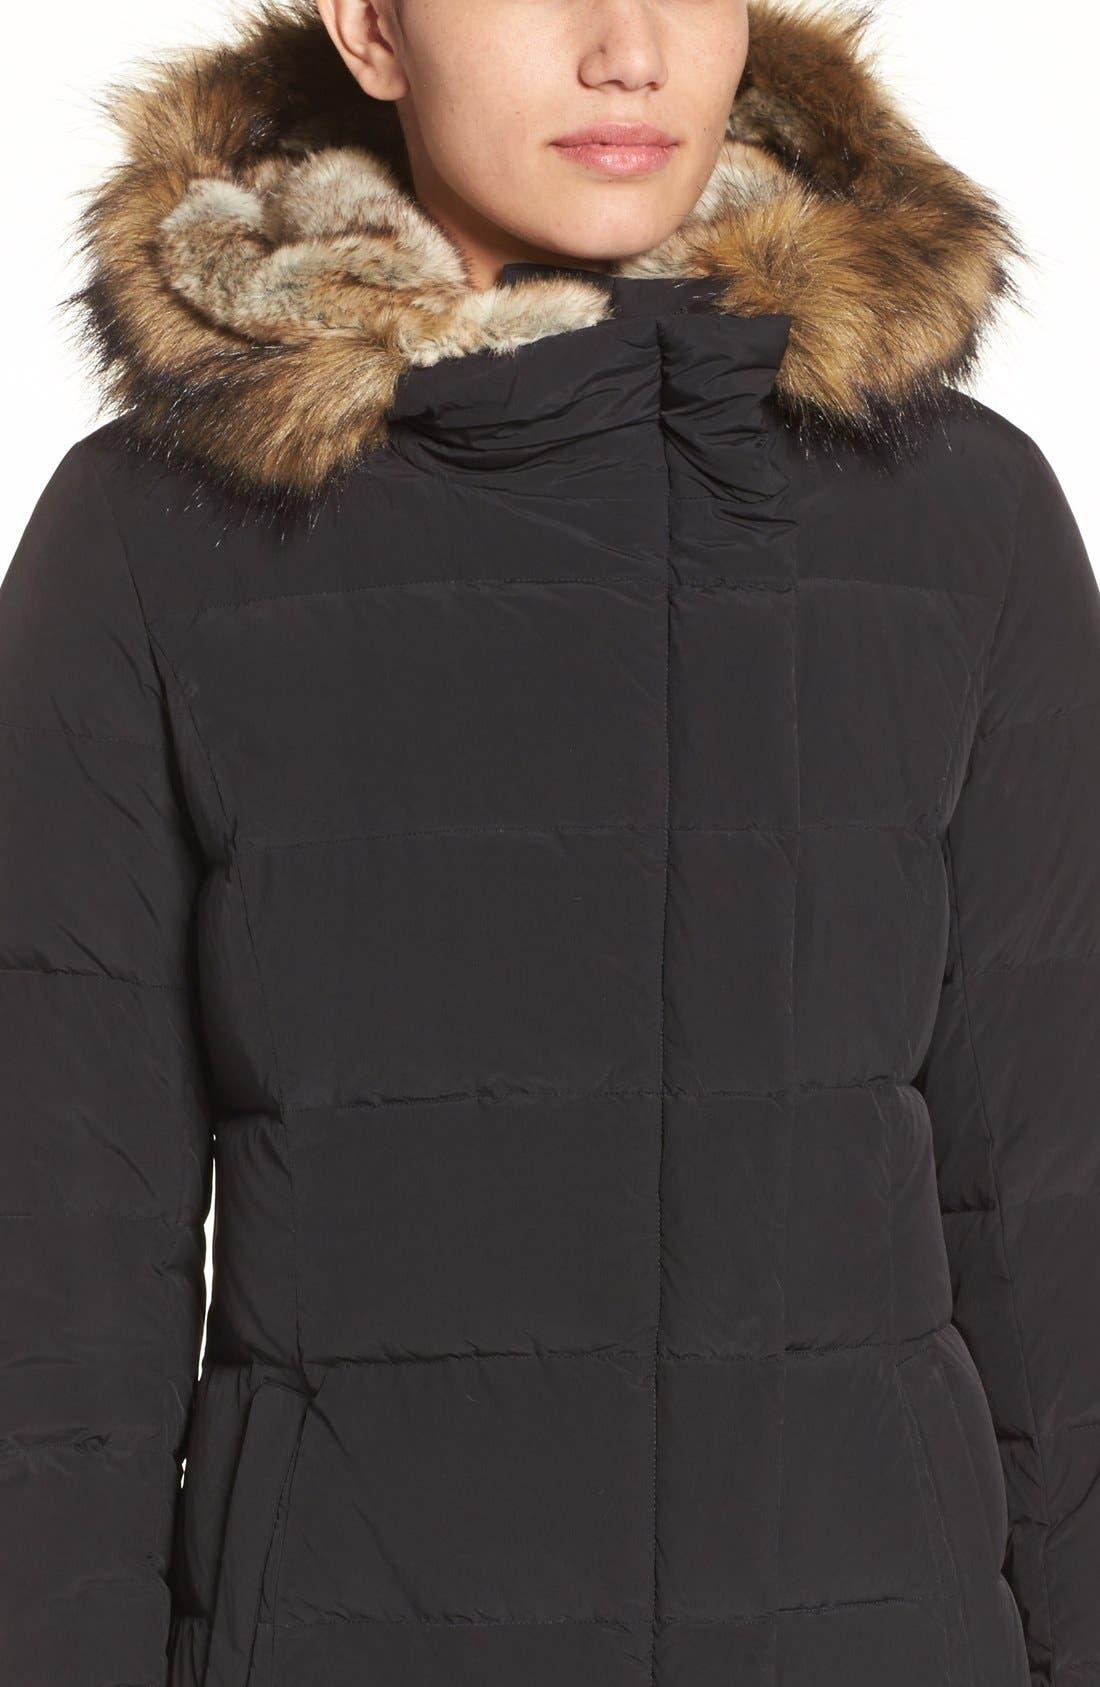 Alternate Image 4  - Cole Haan Asymmetrical Down Coat with Faux Fur Trim